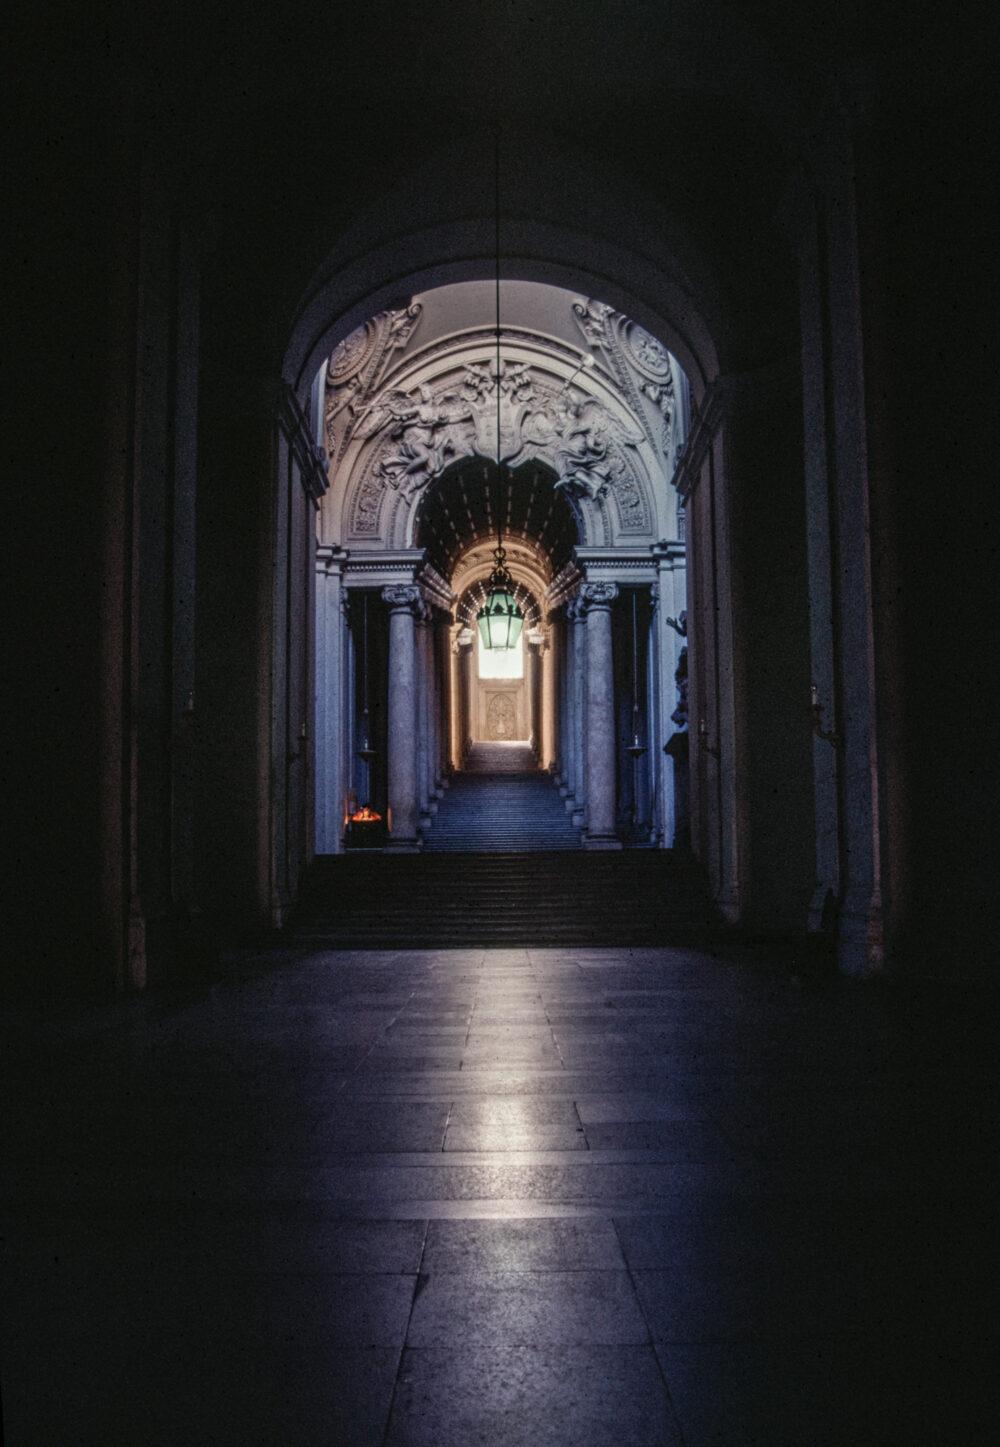 Vaticano, Palazzo Apostolico, Scala Regia